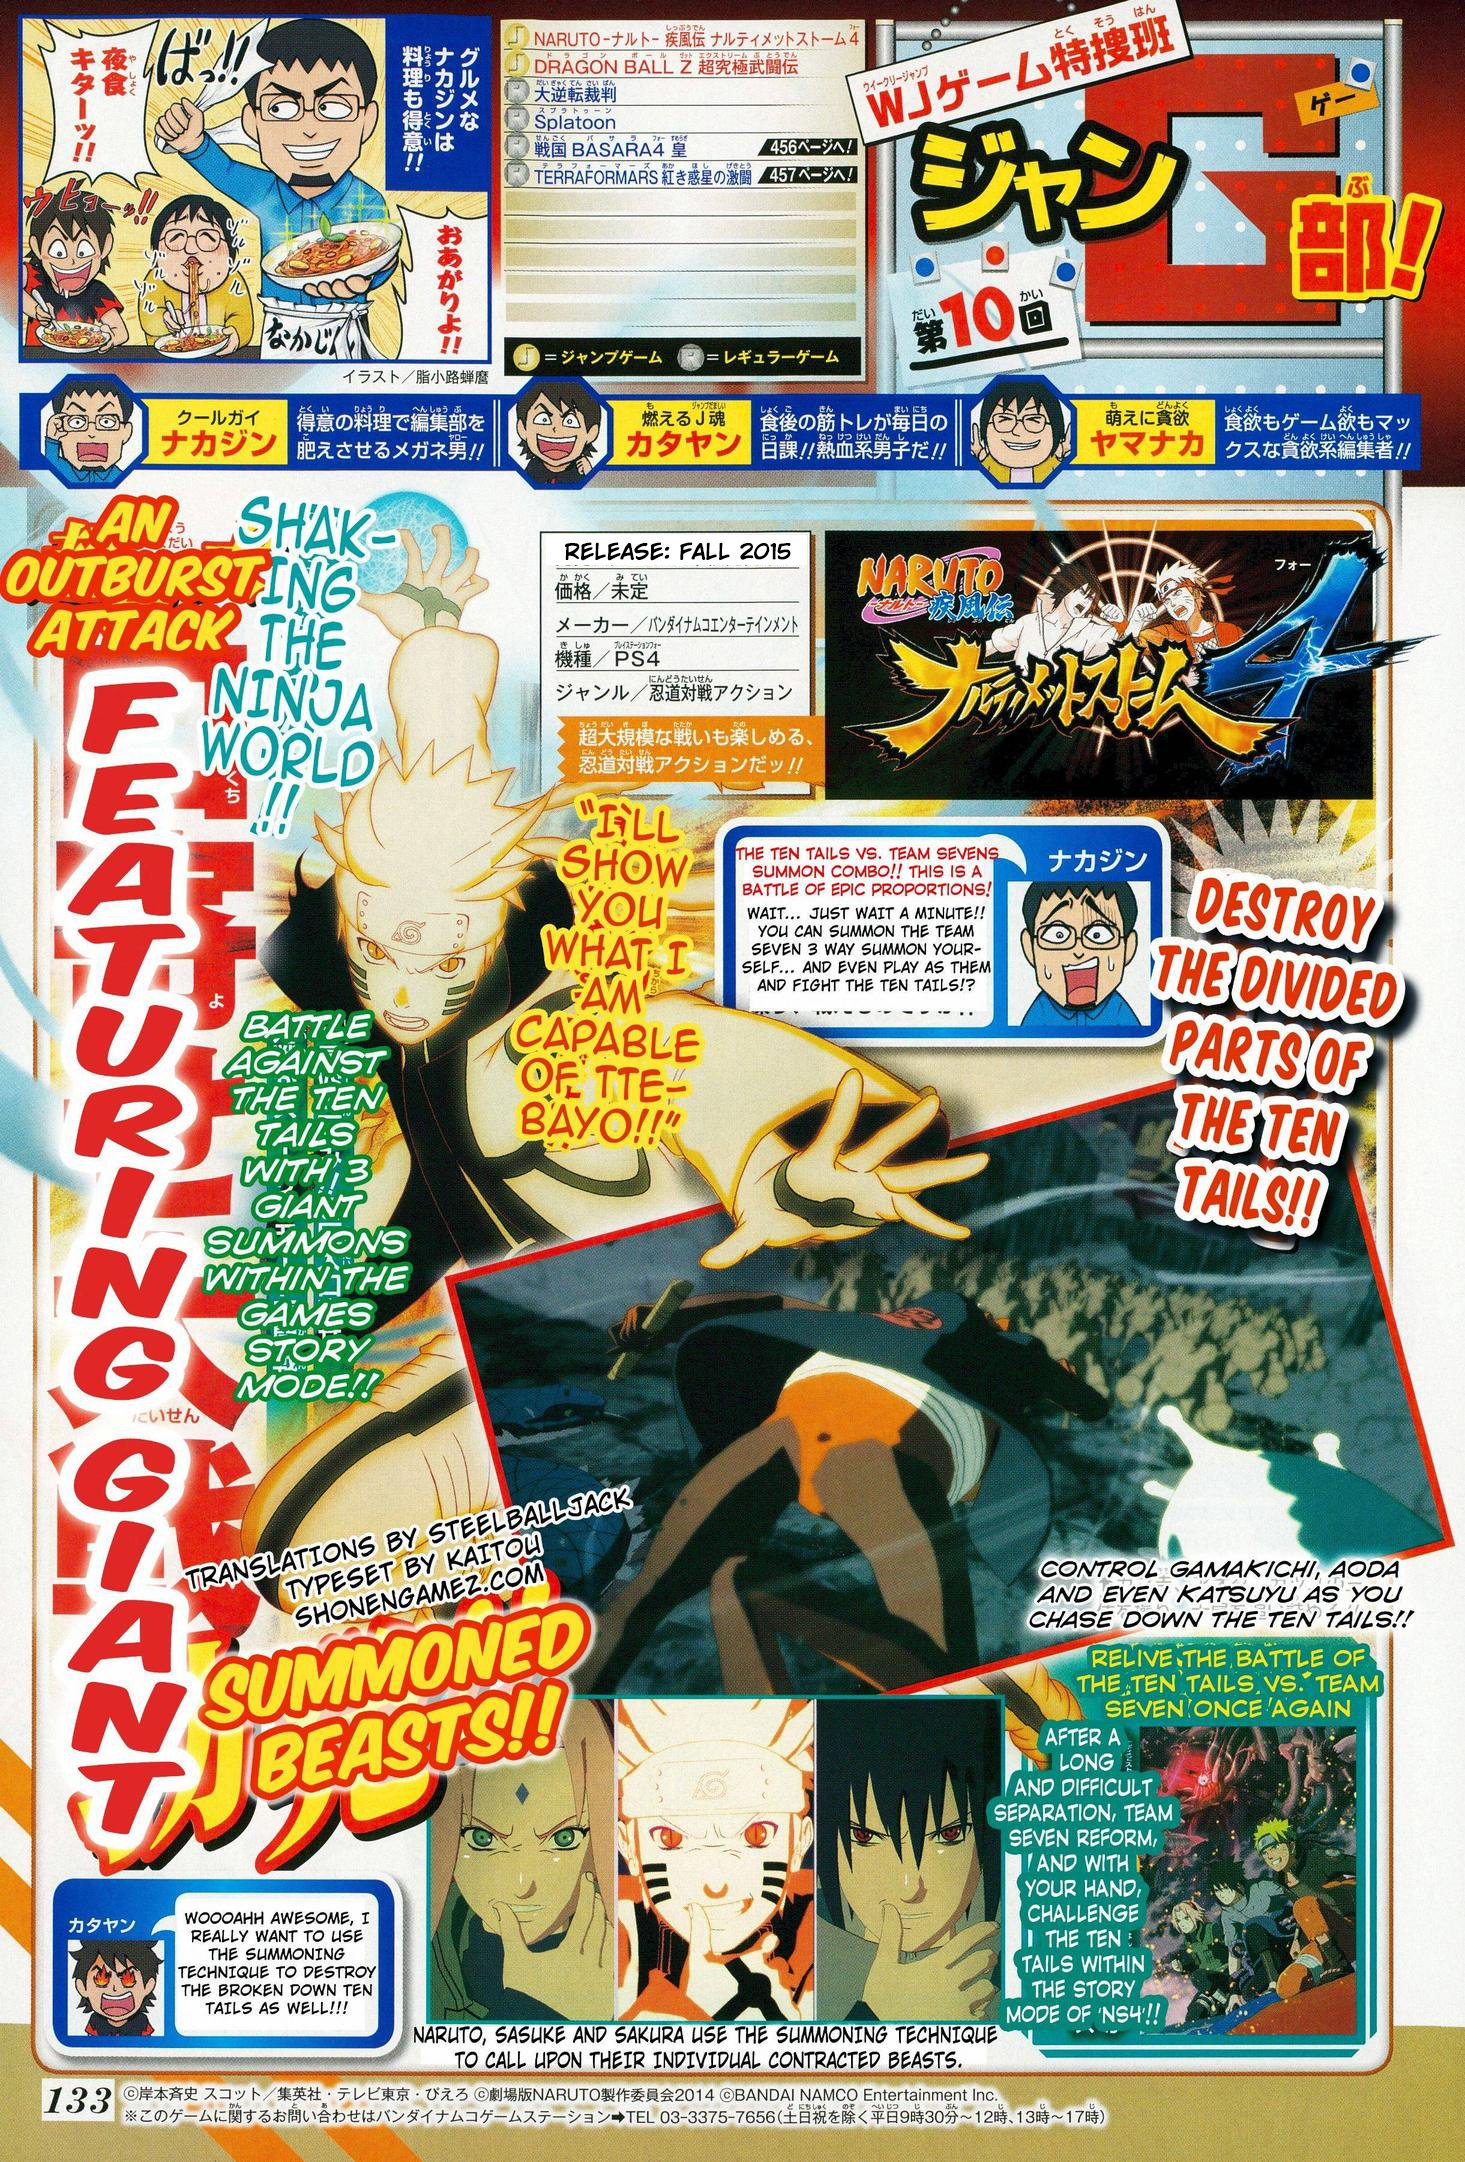 Naruto Shippuden Ultimate Ninja Storm 4 scan 03-04